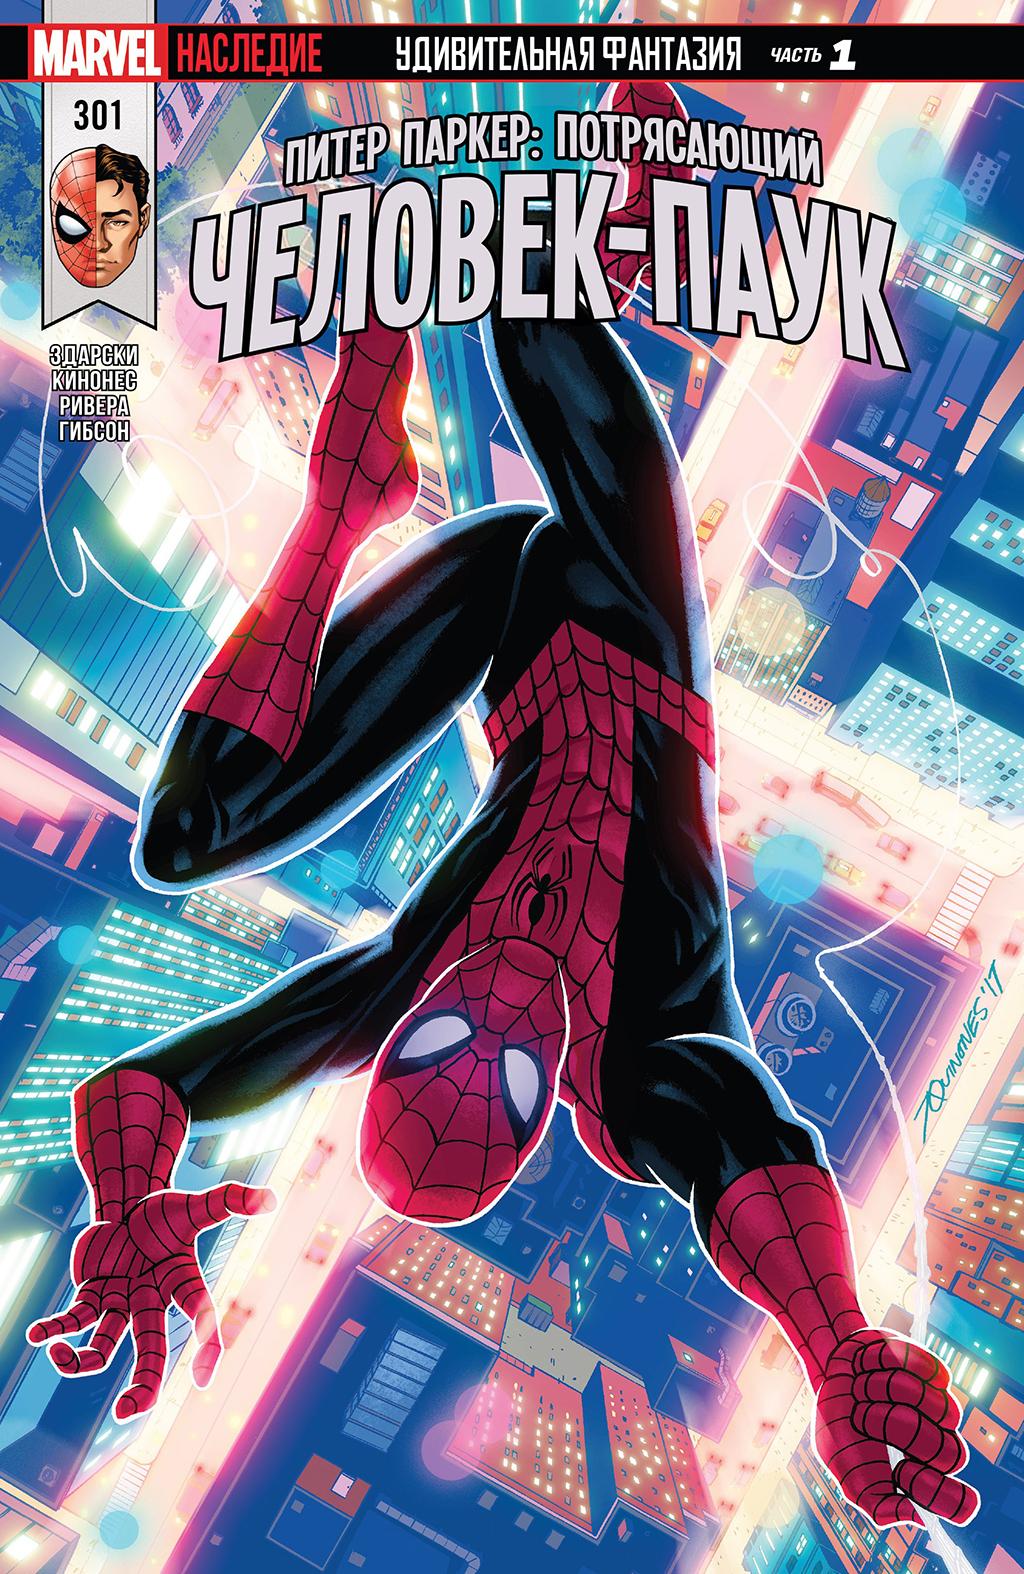 Комикс Питер Паркер: Потрясающий Человек-Паук